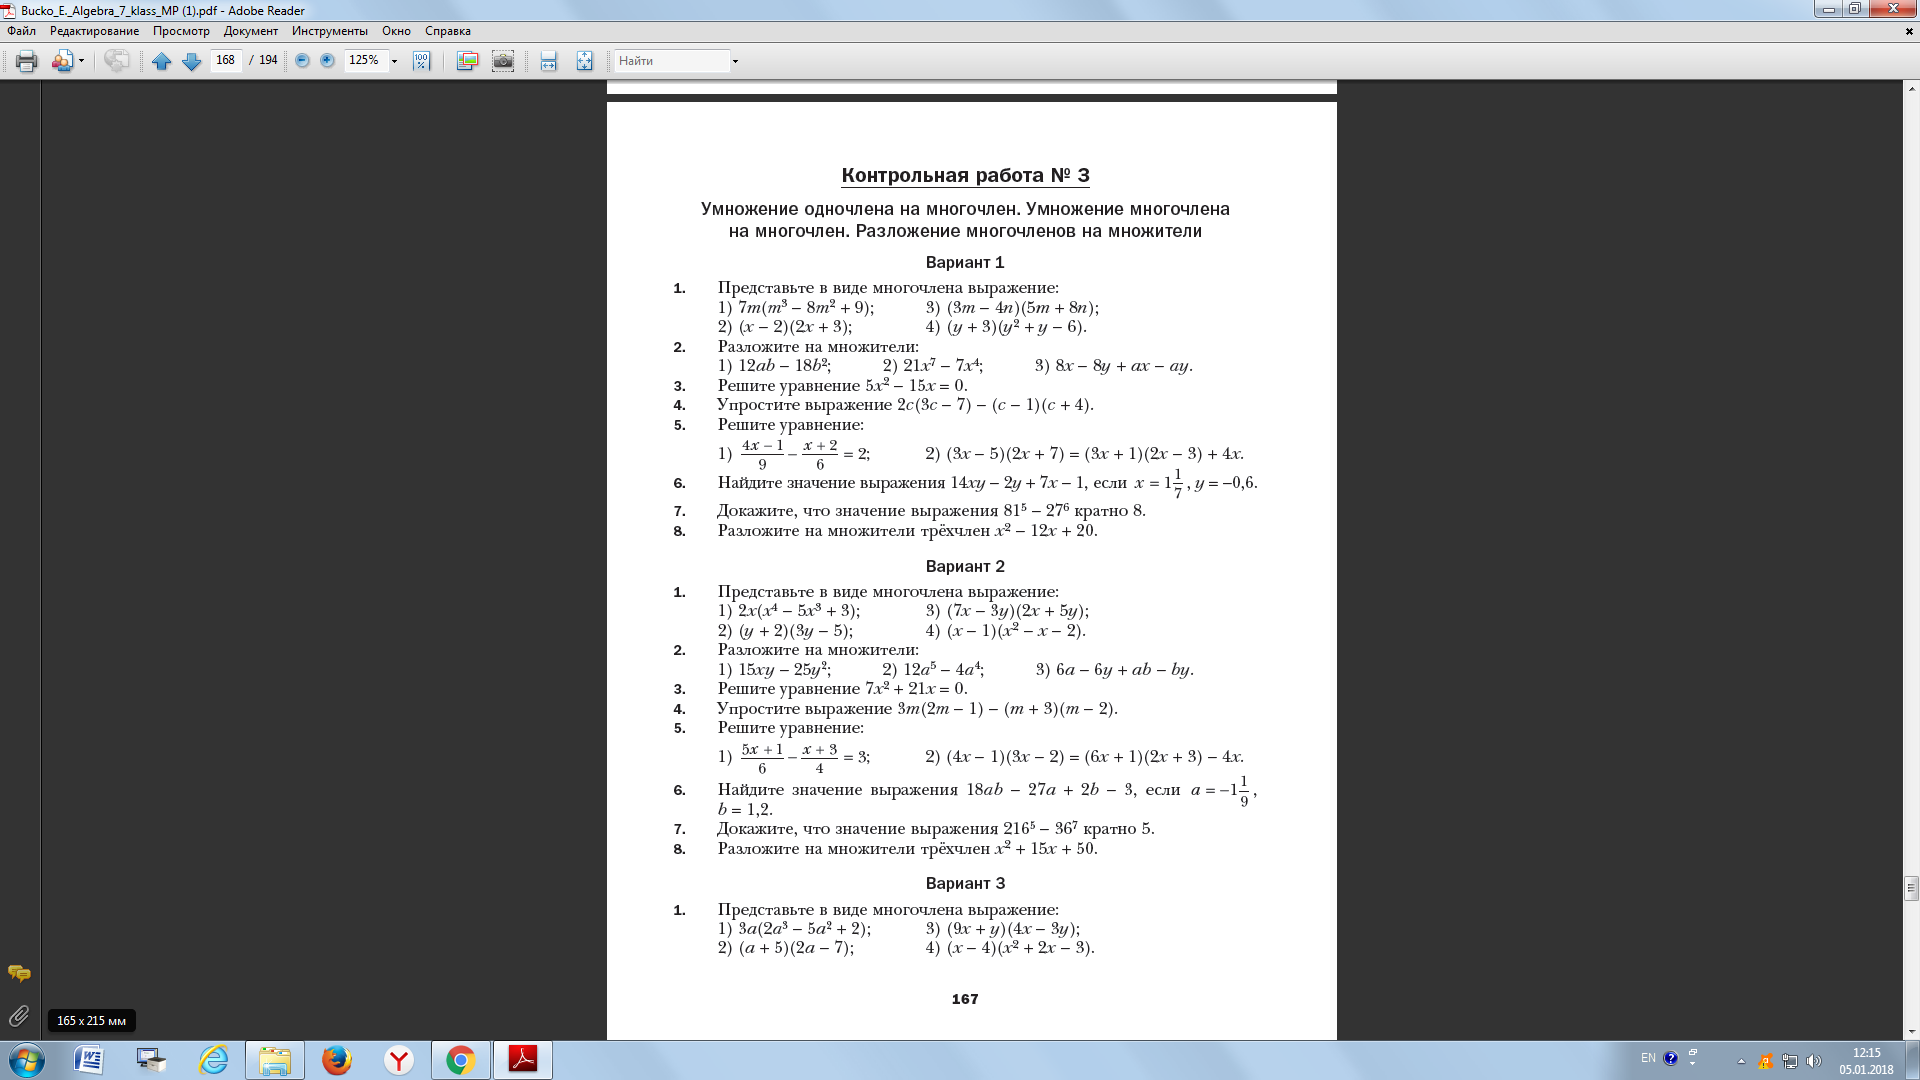 Контрольная работа по теме Умножение одночлена на многочлен  hello html 5e5dedb2 png